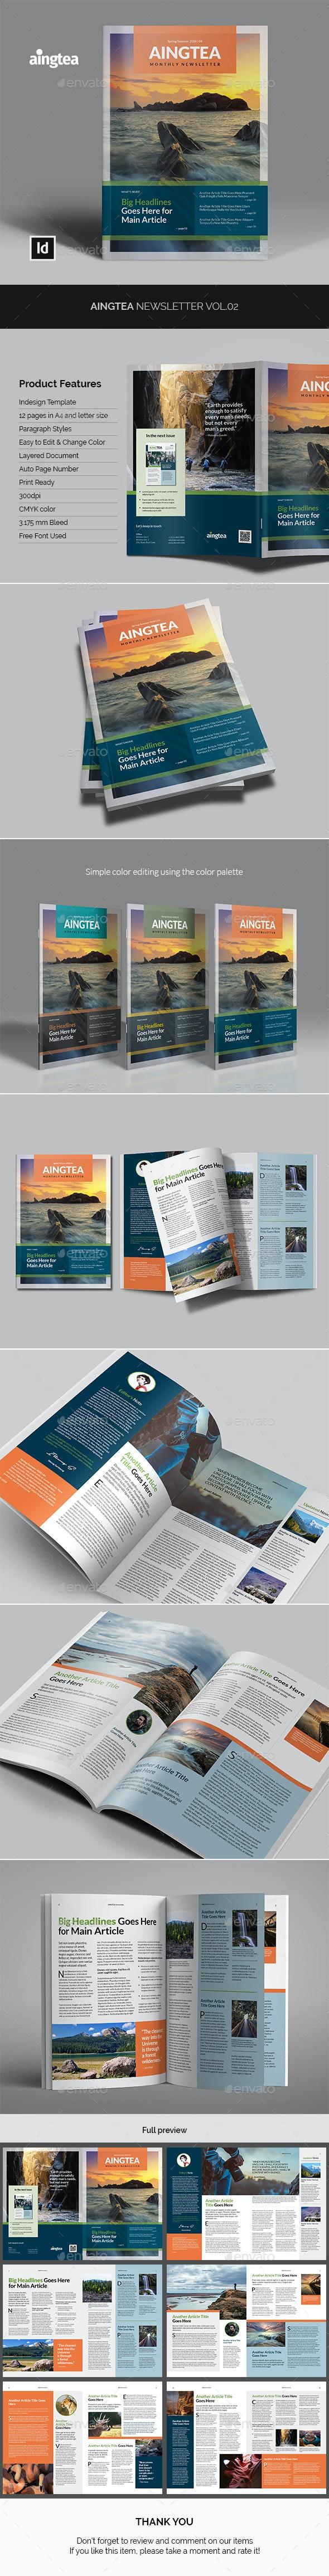 Aingtea Newsletter Vol.02 - Newsletters Print Templates